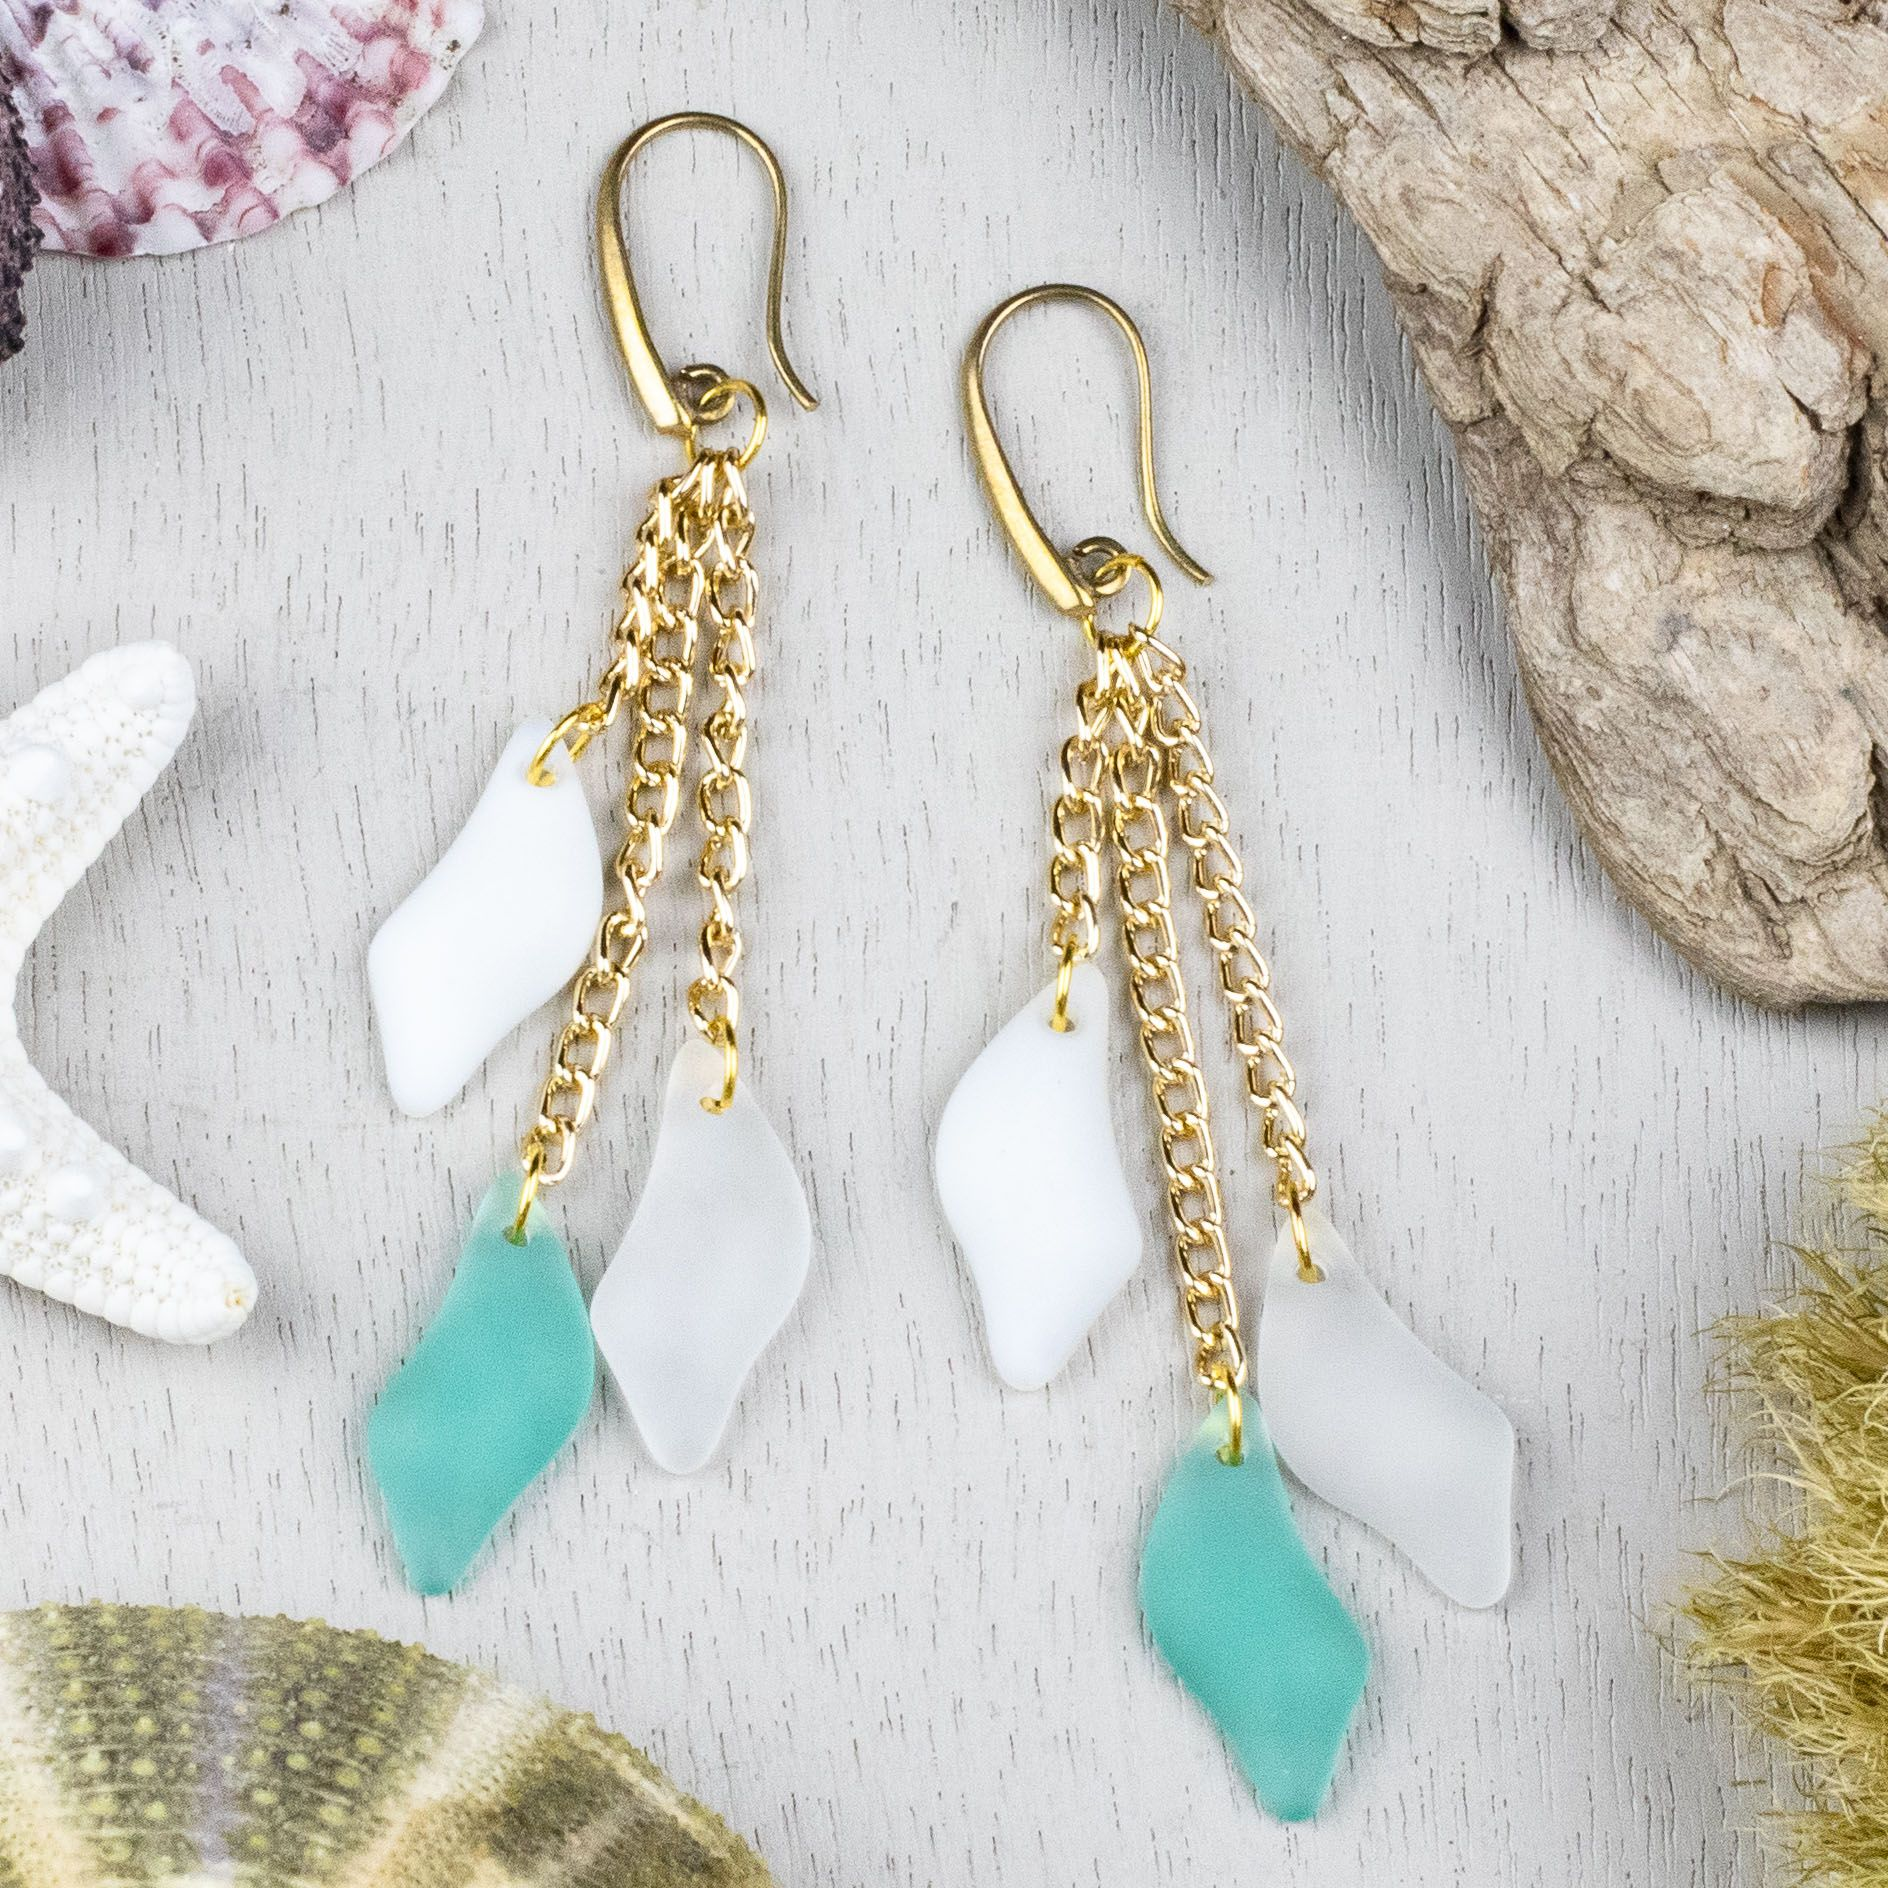 Starfish Charm and Tumbled Sea Beach Glass with Turquoise Pearls Drop Earrings Handmade Dangle